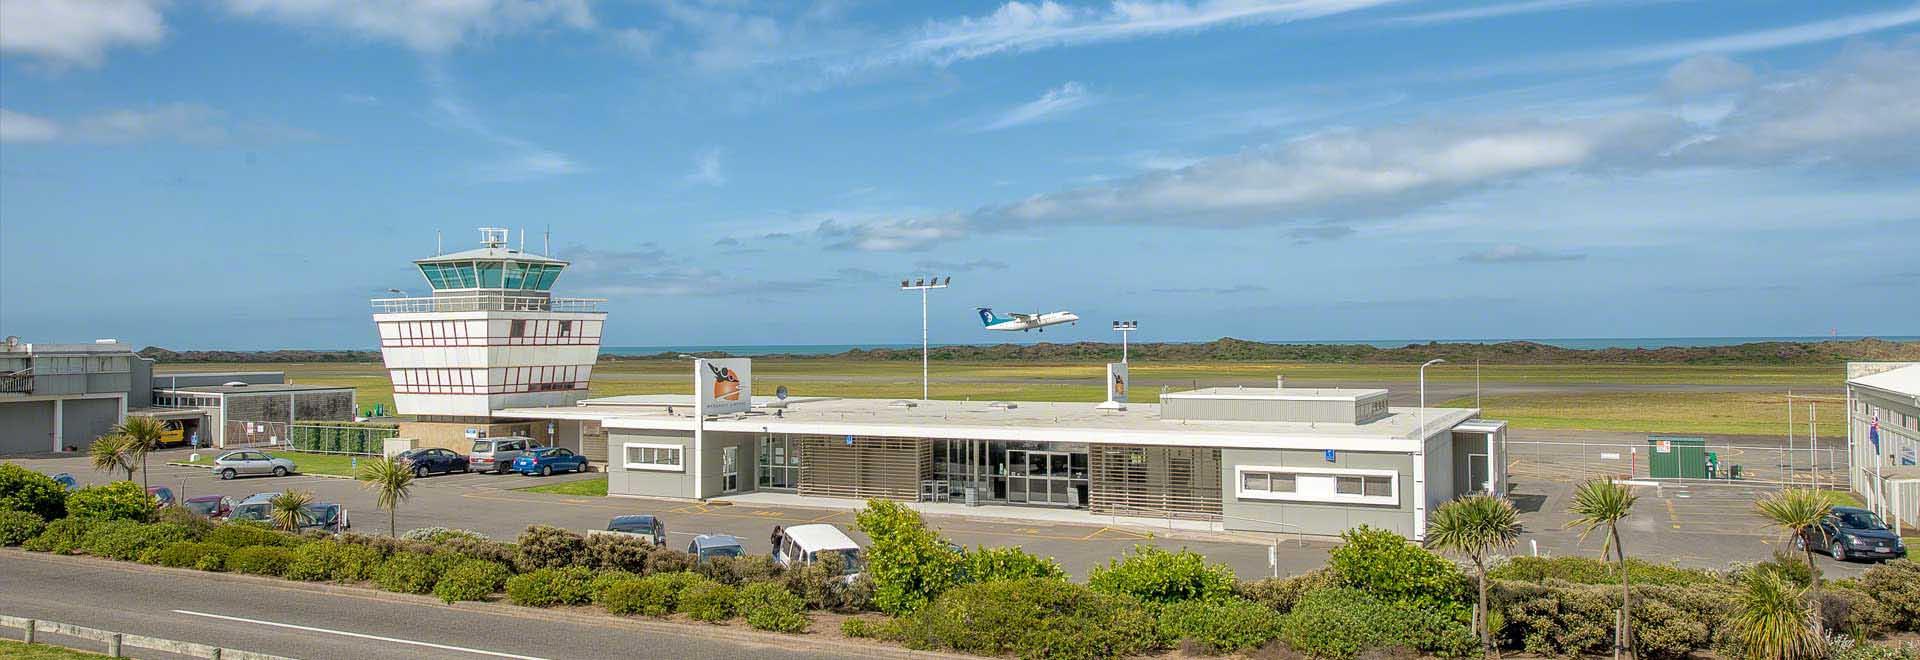 MANAWATU-WANGANUI - Whanganui airport is a crucial hub for the Manawatu-Wanganui region